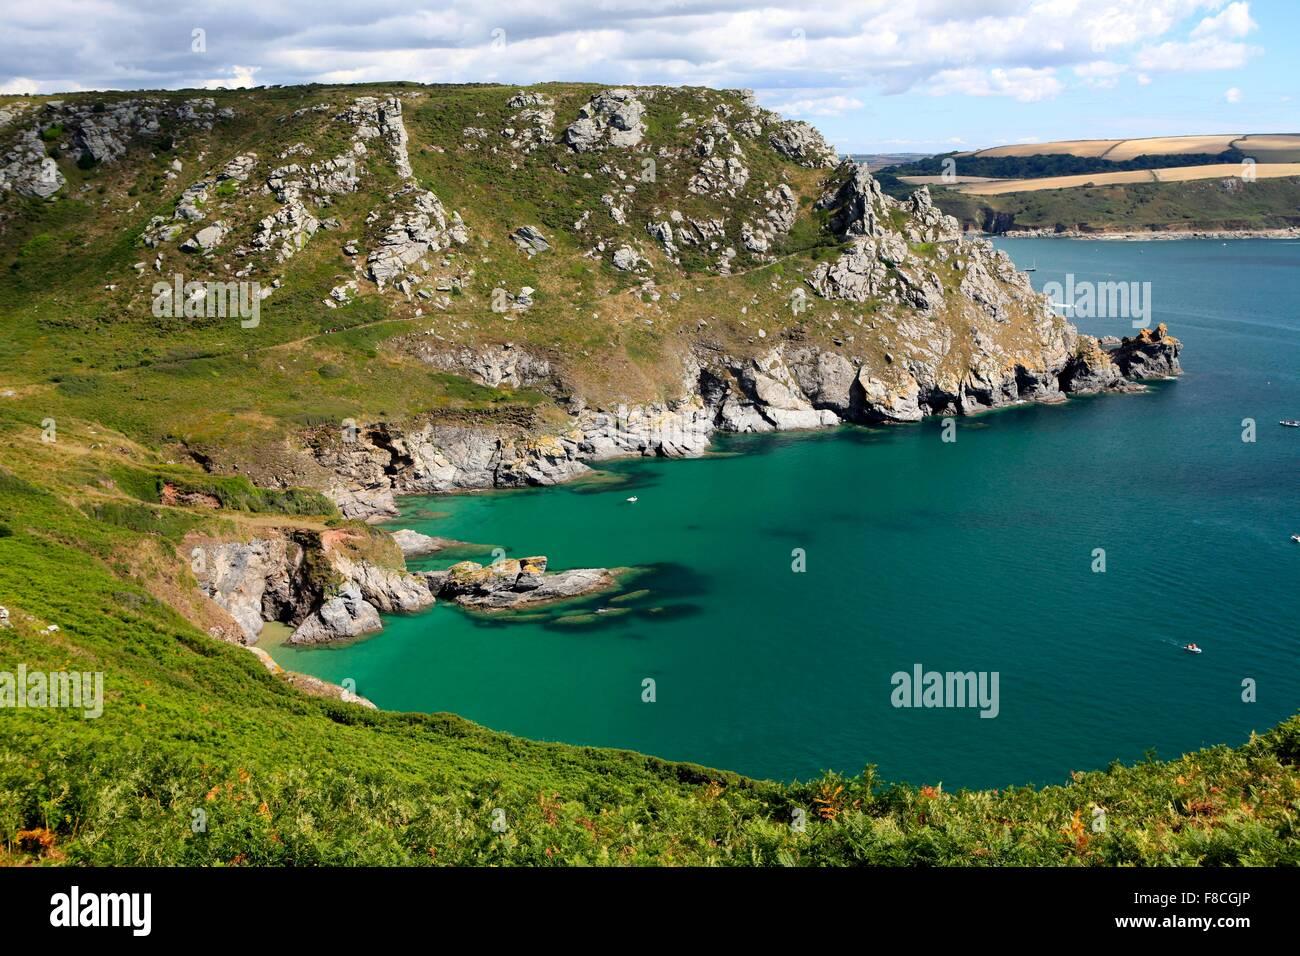 Beautiful light at Starehole Bay, Near Salcombe, South Hams, Devon, England, UK - Stock Image